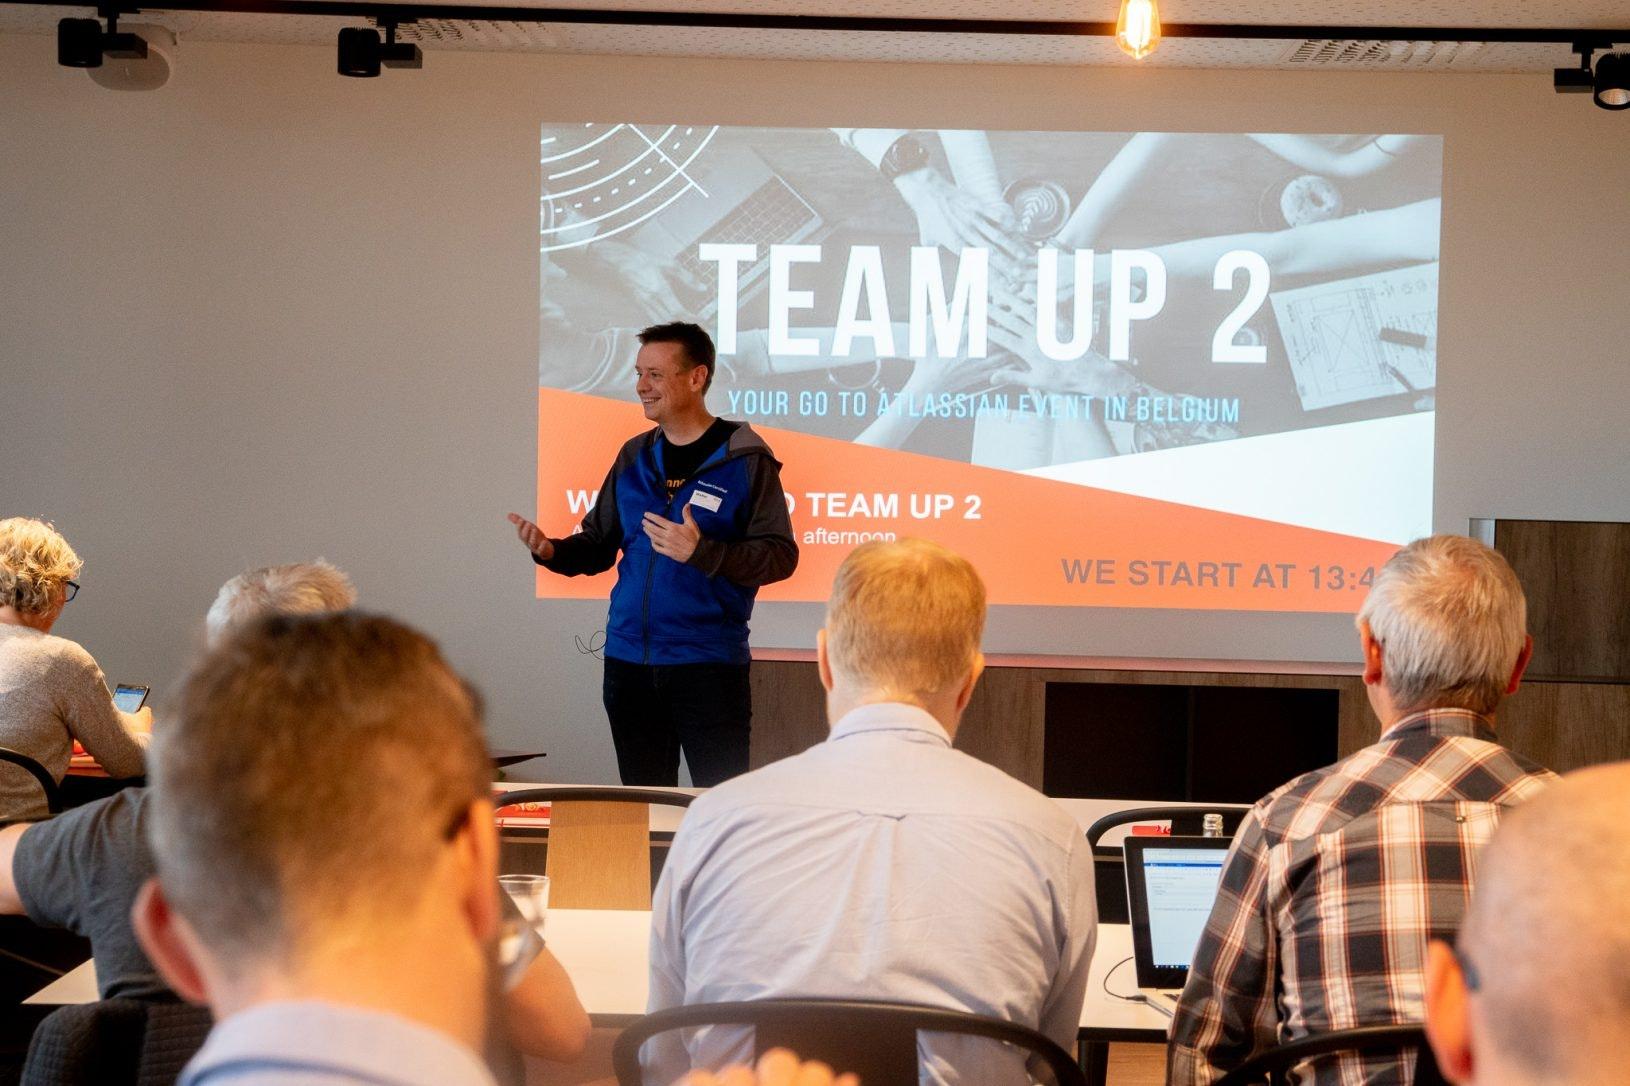 Team member talk about Atlassian team up event